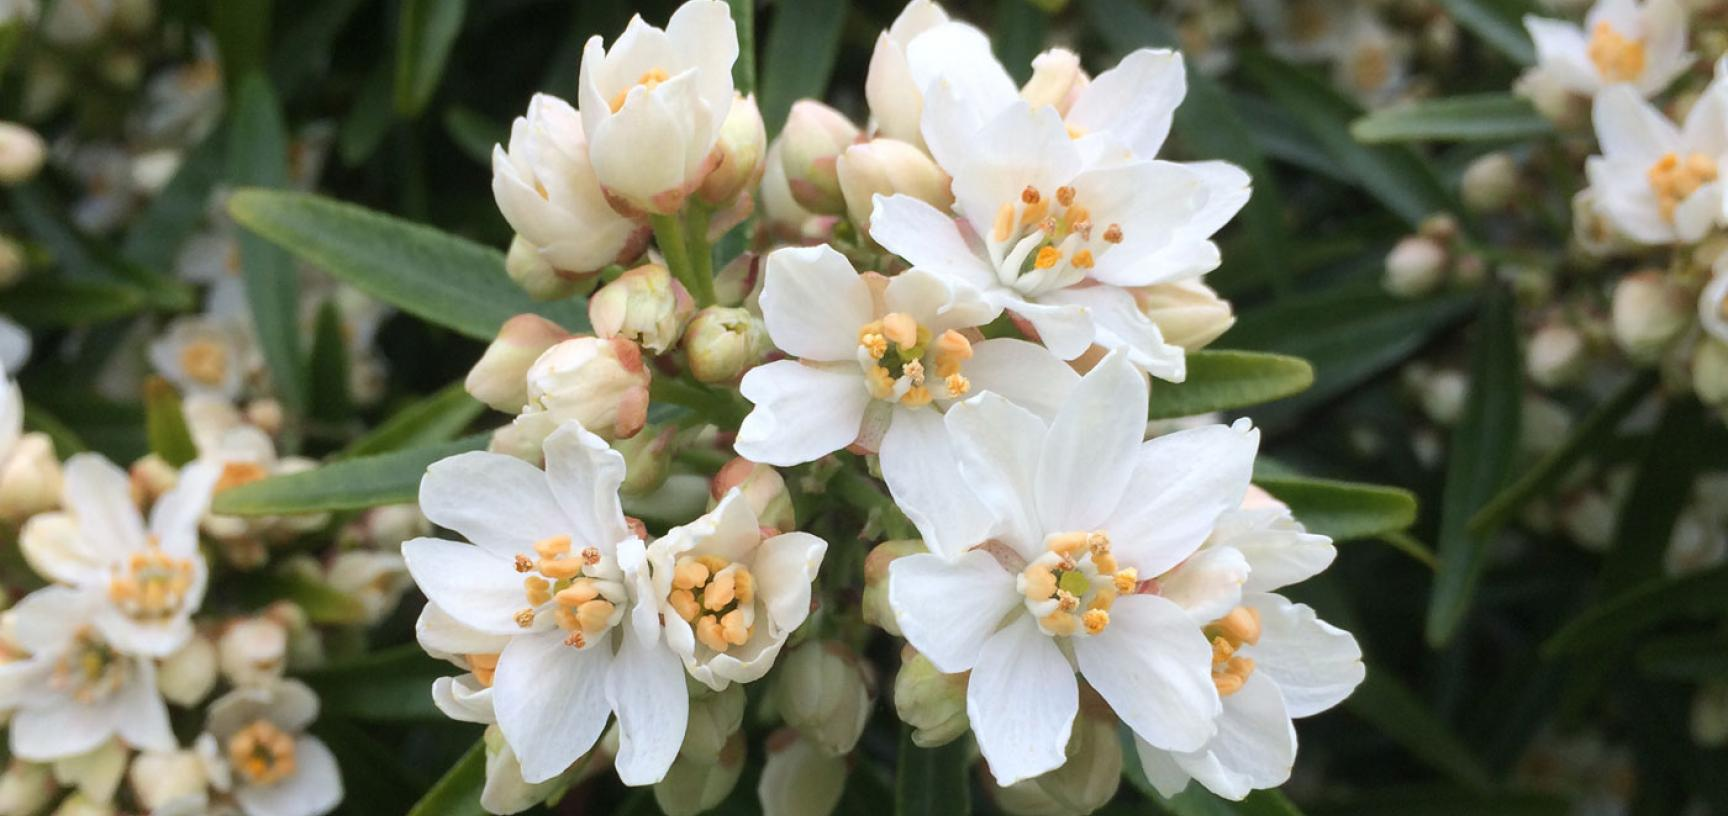 choisya x dewitteana 'aztec pearl'